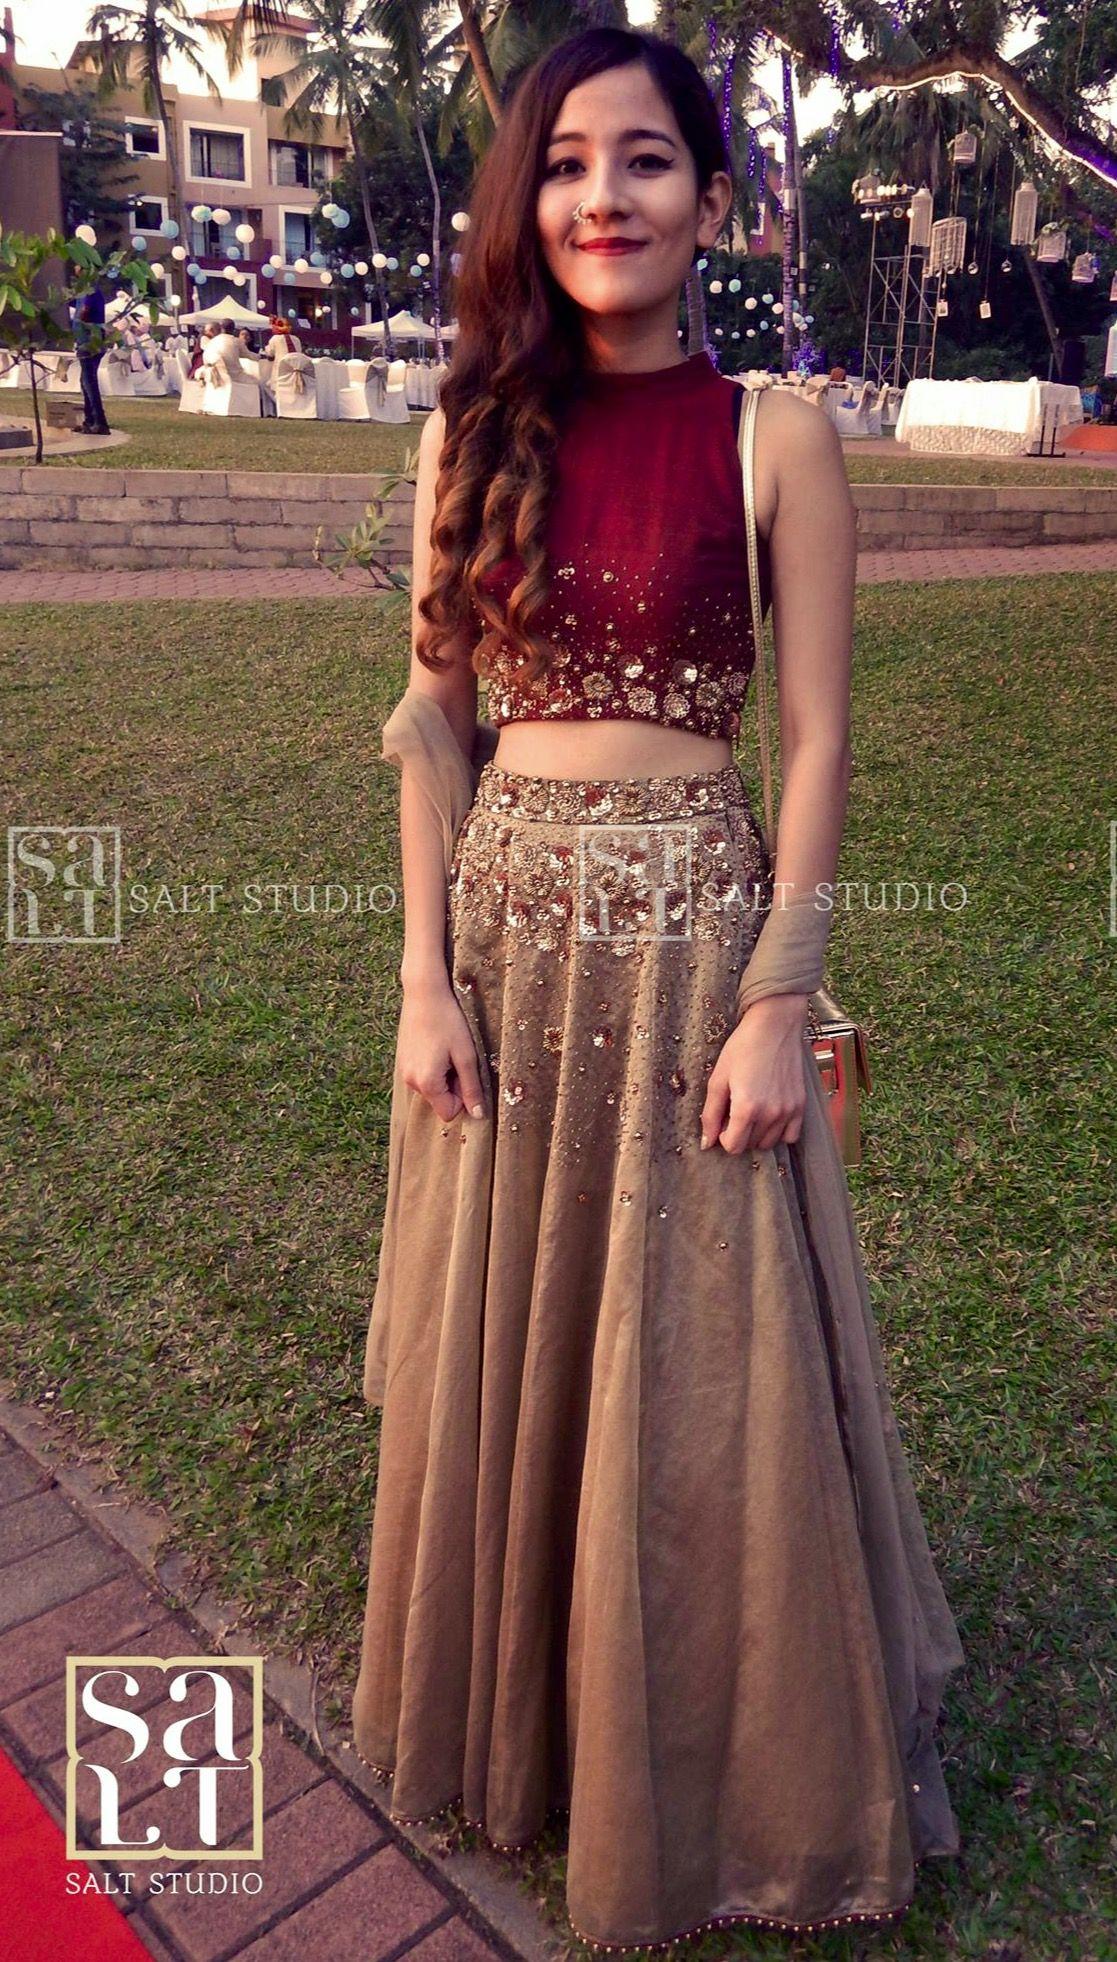 Salt Studio Pakistani Outfits Indian Dresses Wedding Dresses For Girls,Long Sleeve Wedding Guest Dresses